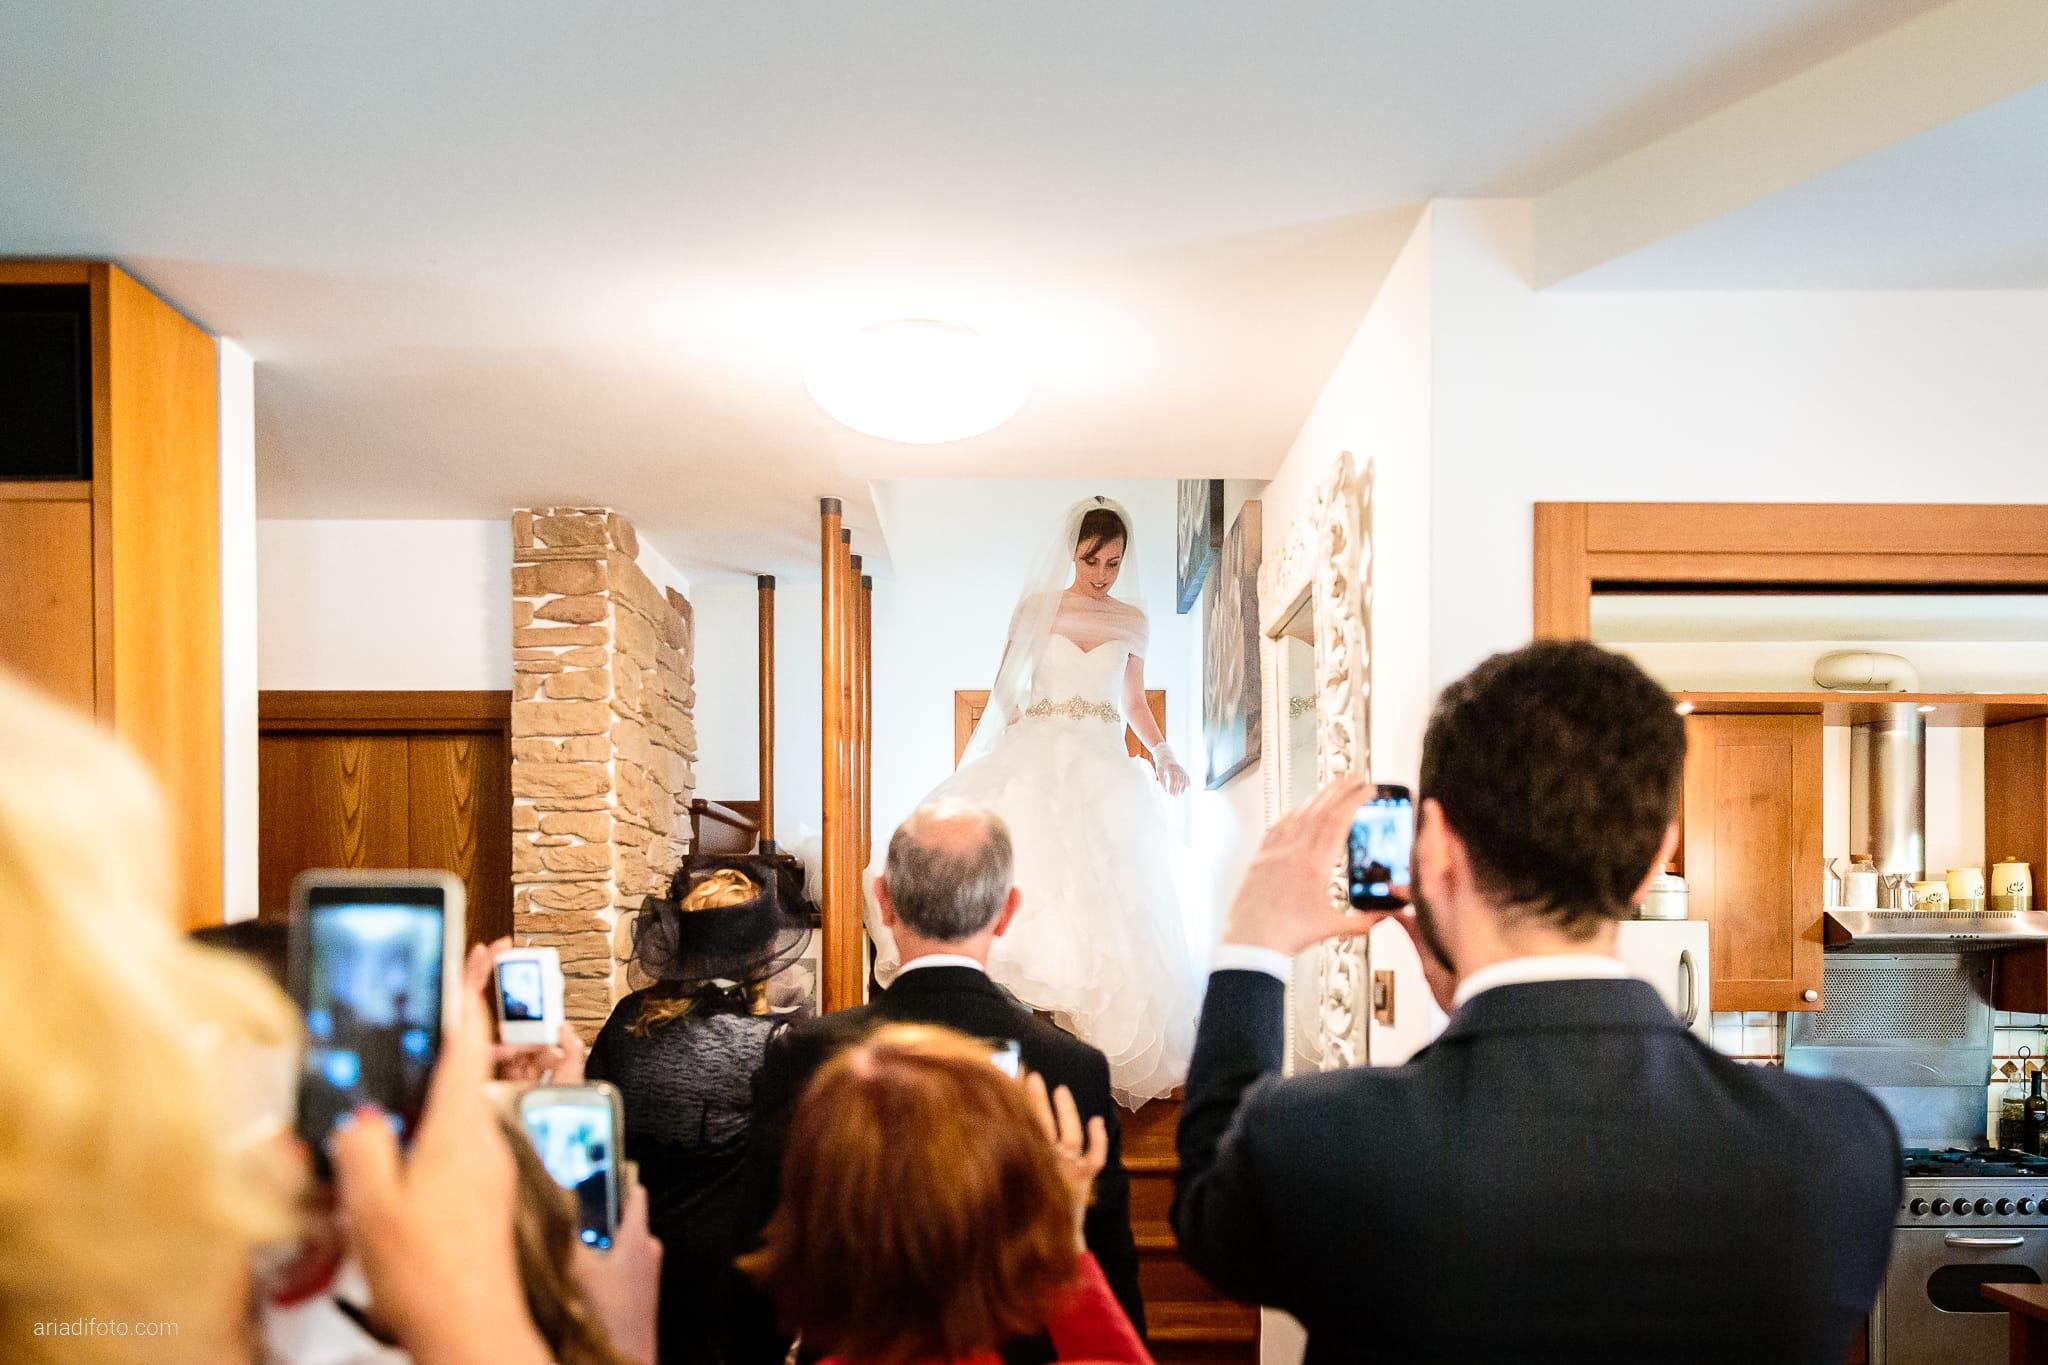 Sarah Matteo Matrimonio Moruzzo Agriturismo Il Vagabondo Buttrio Udine preparativi